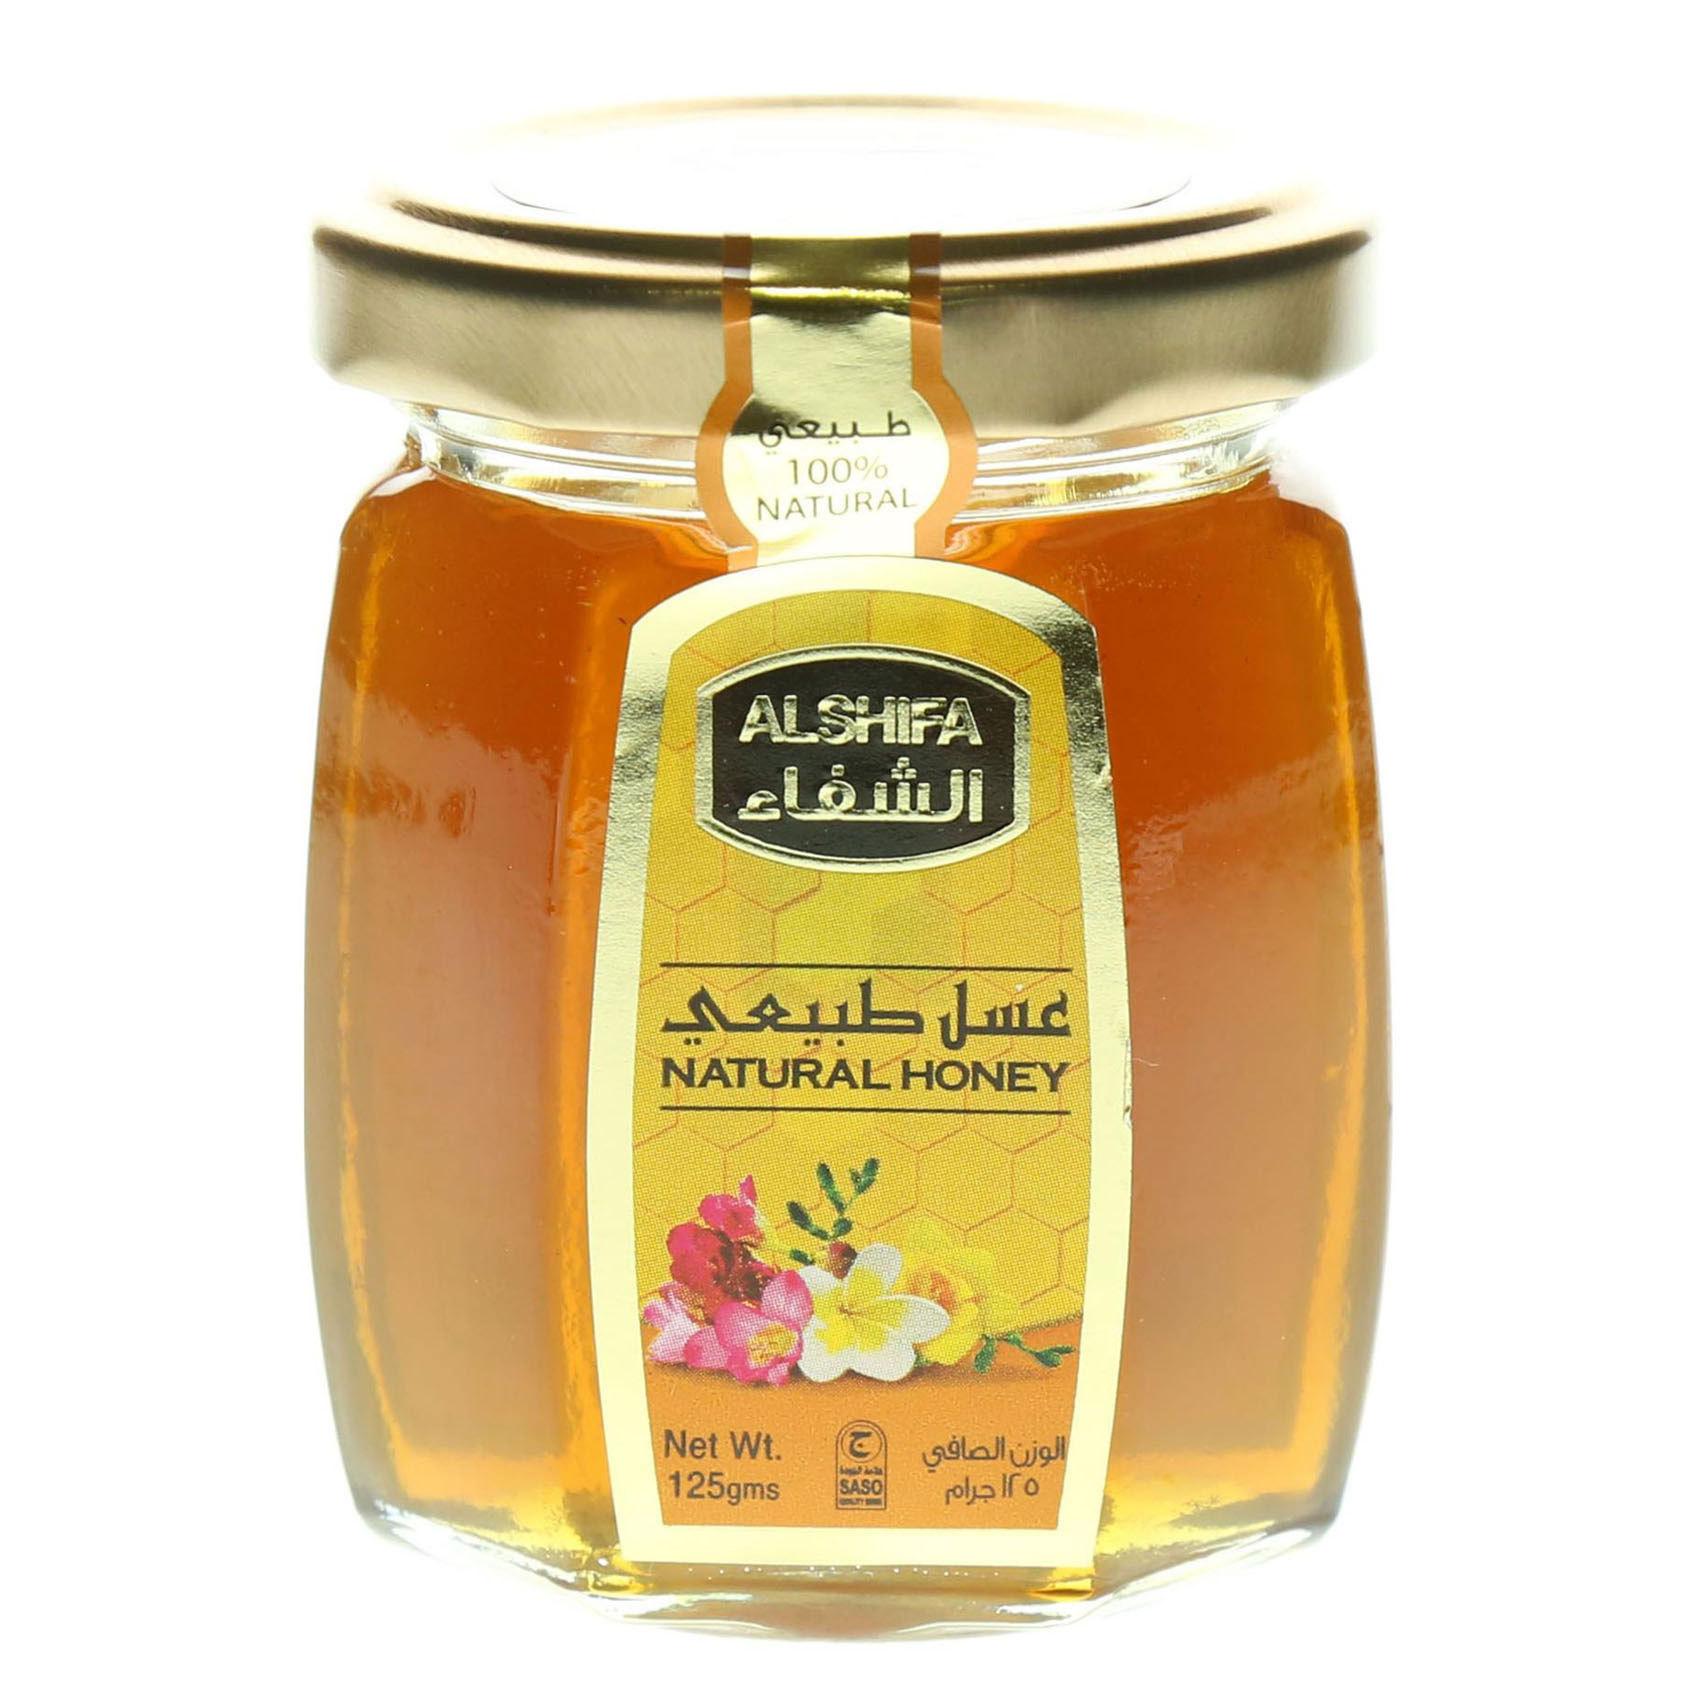 AL SHIFA HONEY NATURAL 125G